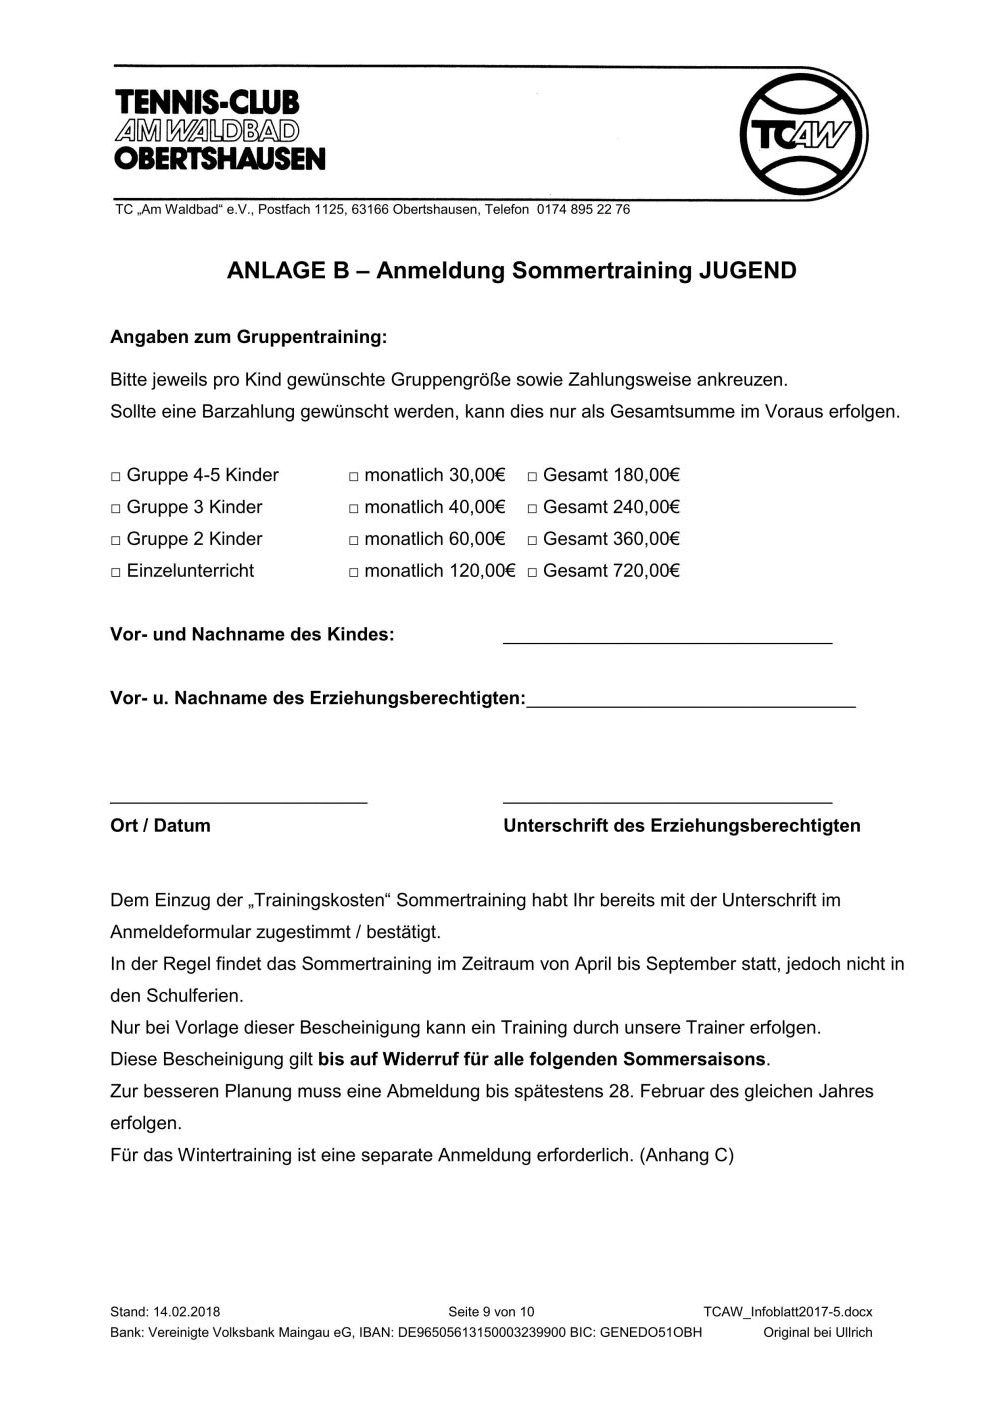 2017_Mitgliedsantrag-Training-Jugend_V2_02_1000x1414